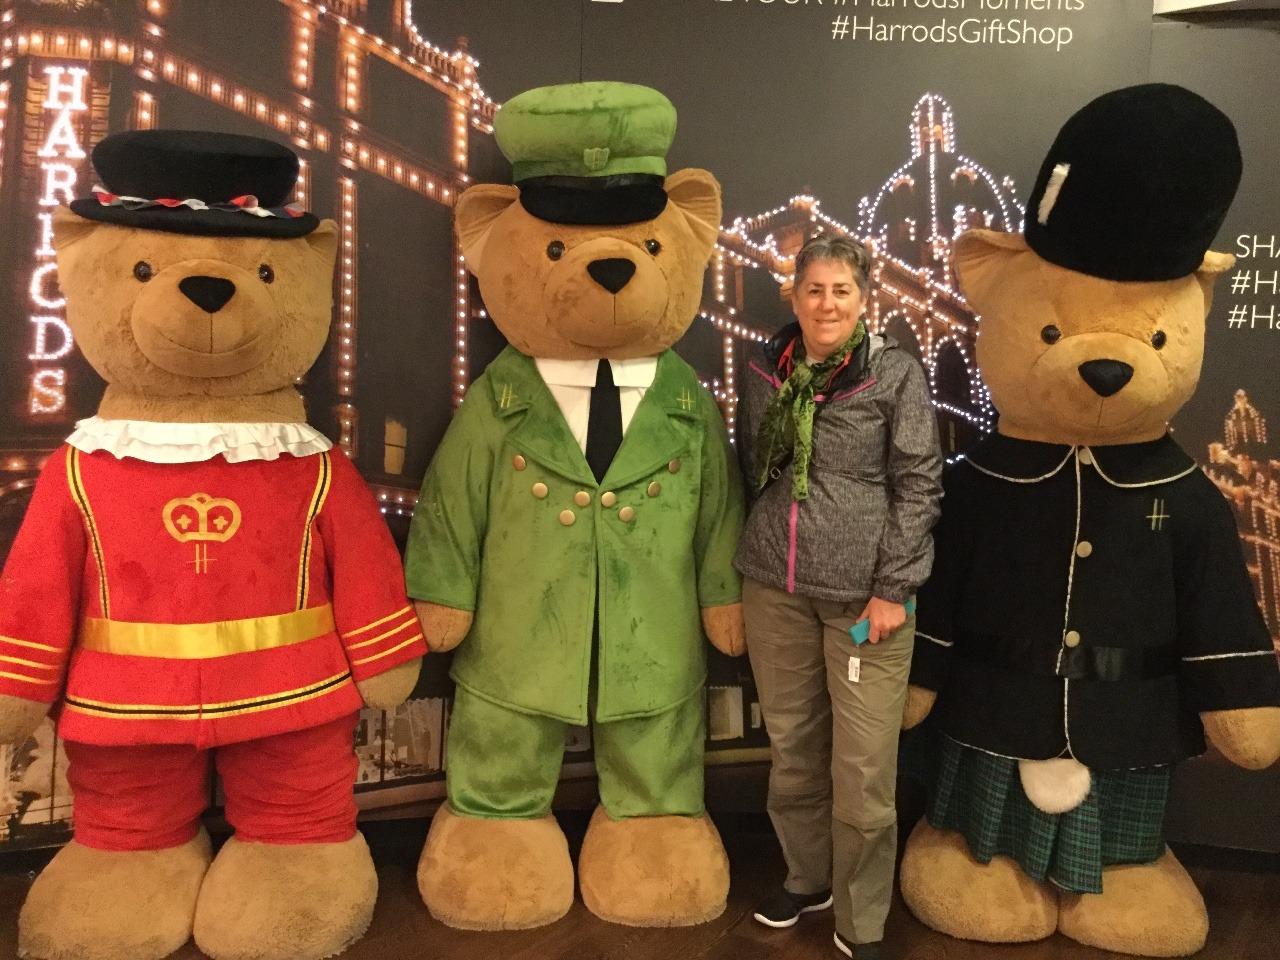 Me and the Harrod's Bears